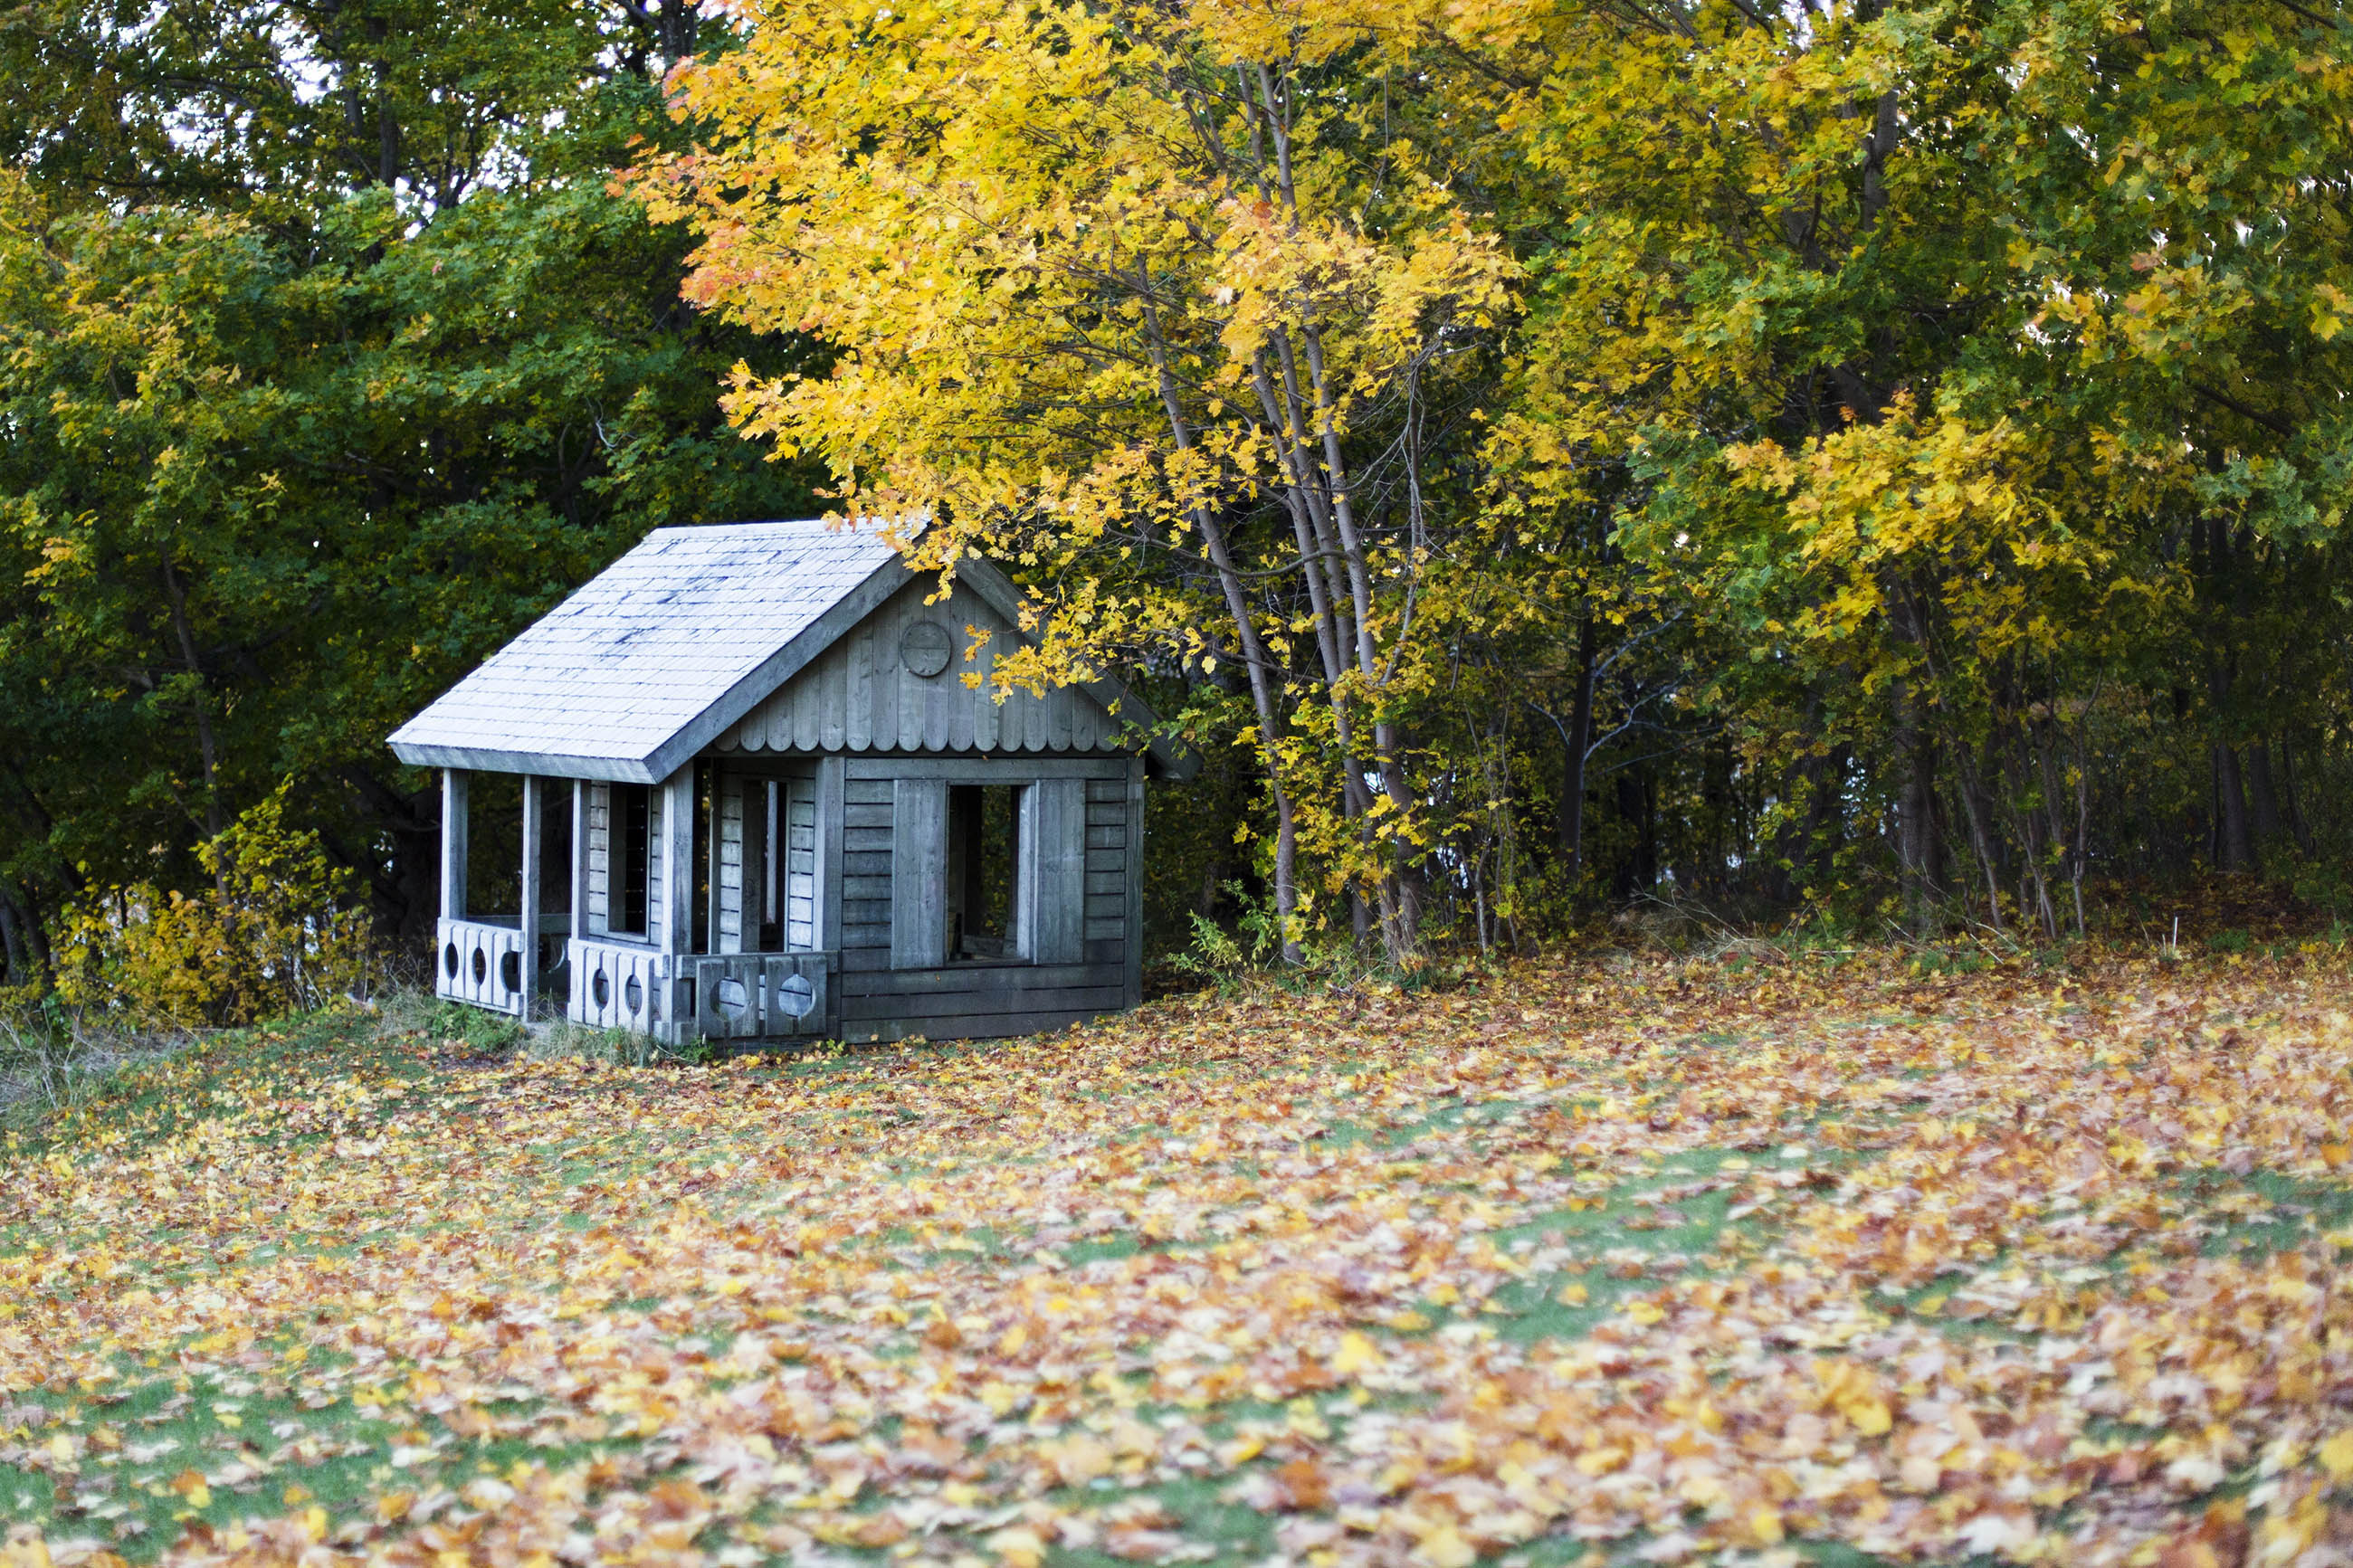 Autumn cottage, Season, Orange, Outside, Park, HQ Photo